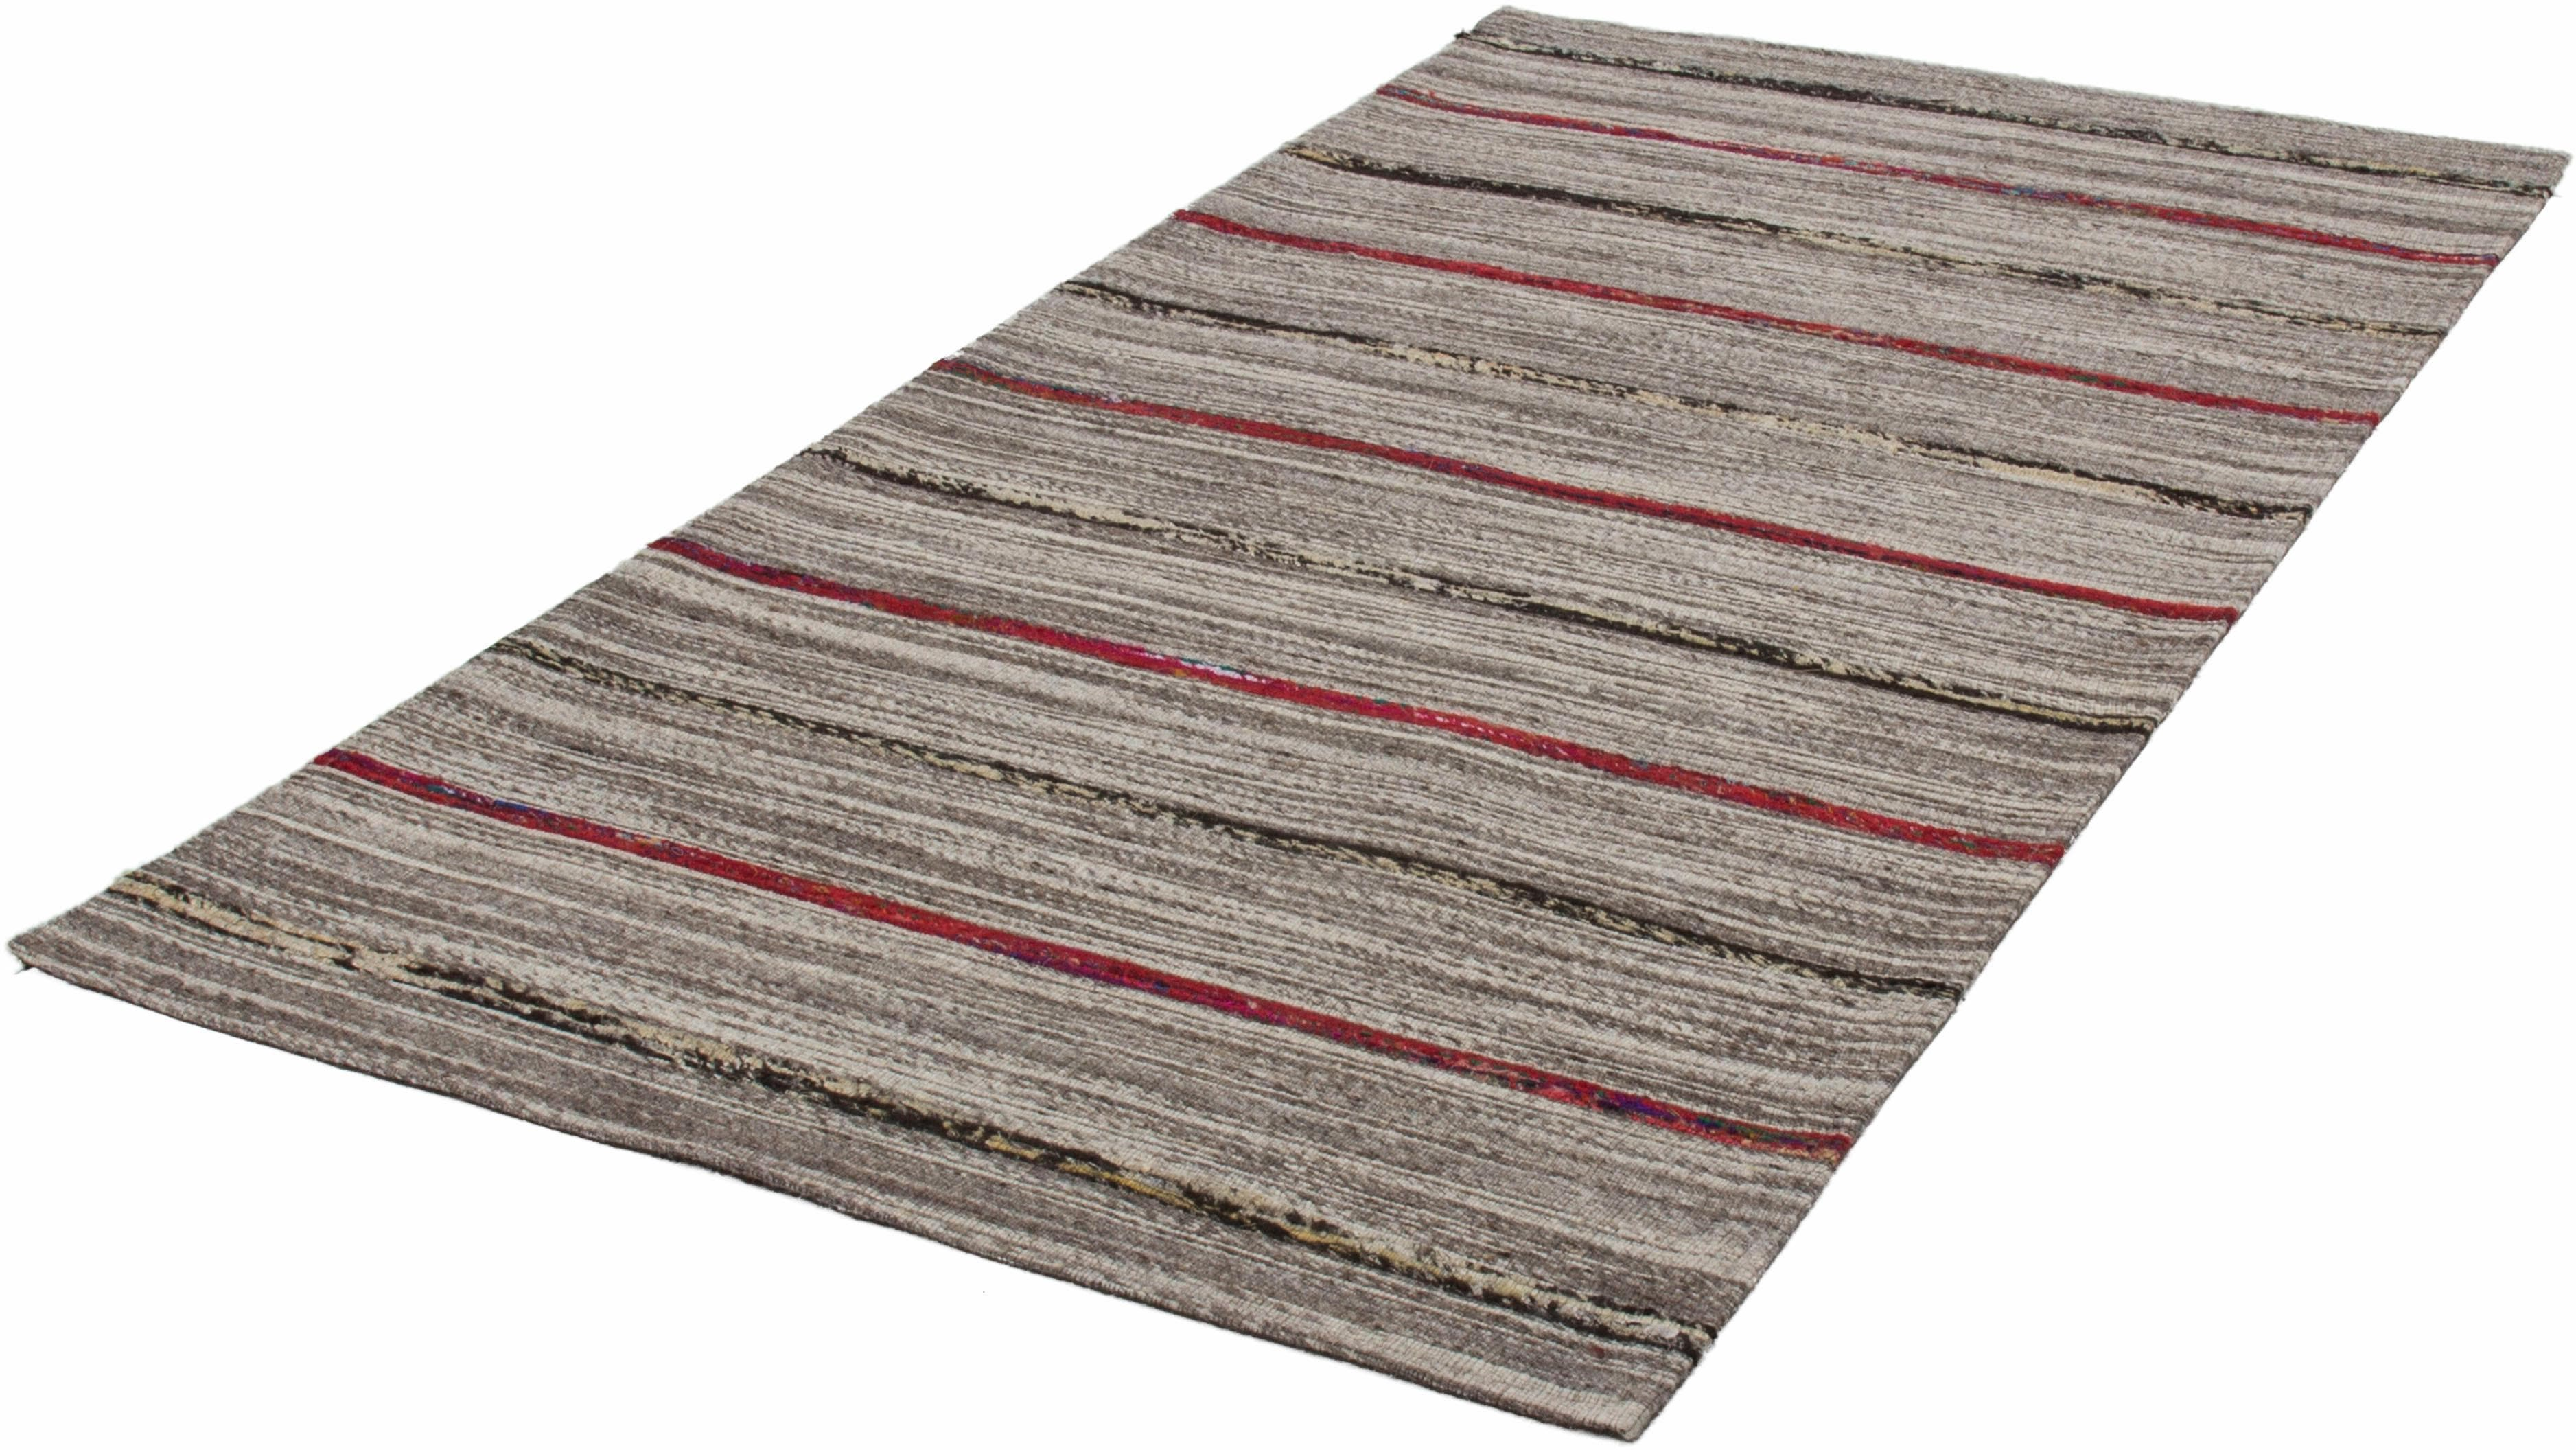 Teppich Duarte 110 Kayoom rechteckig Höhe 16 mm handgewebt